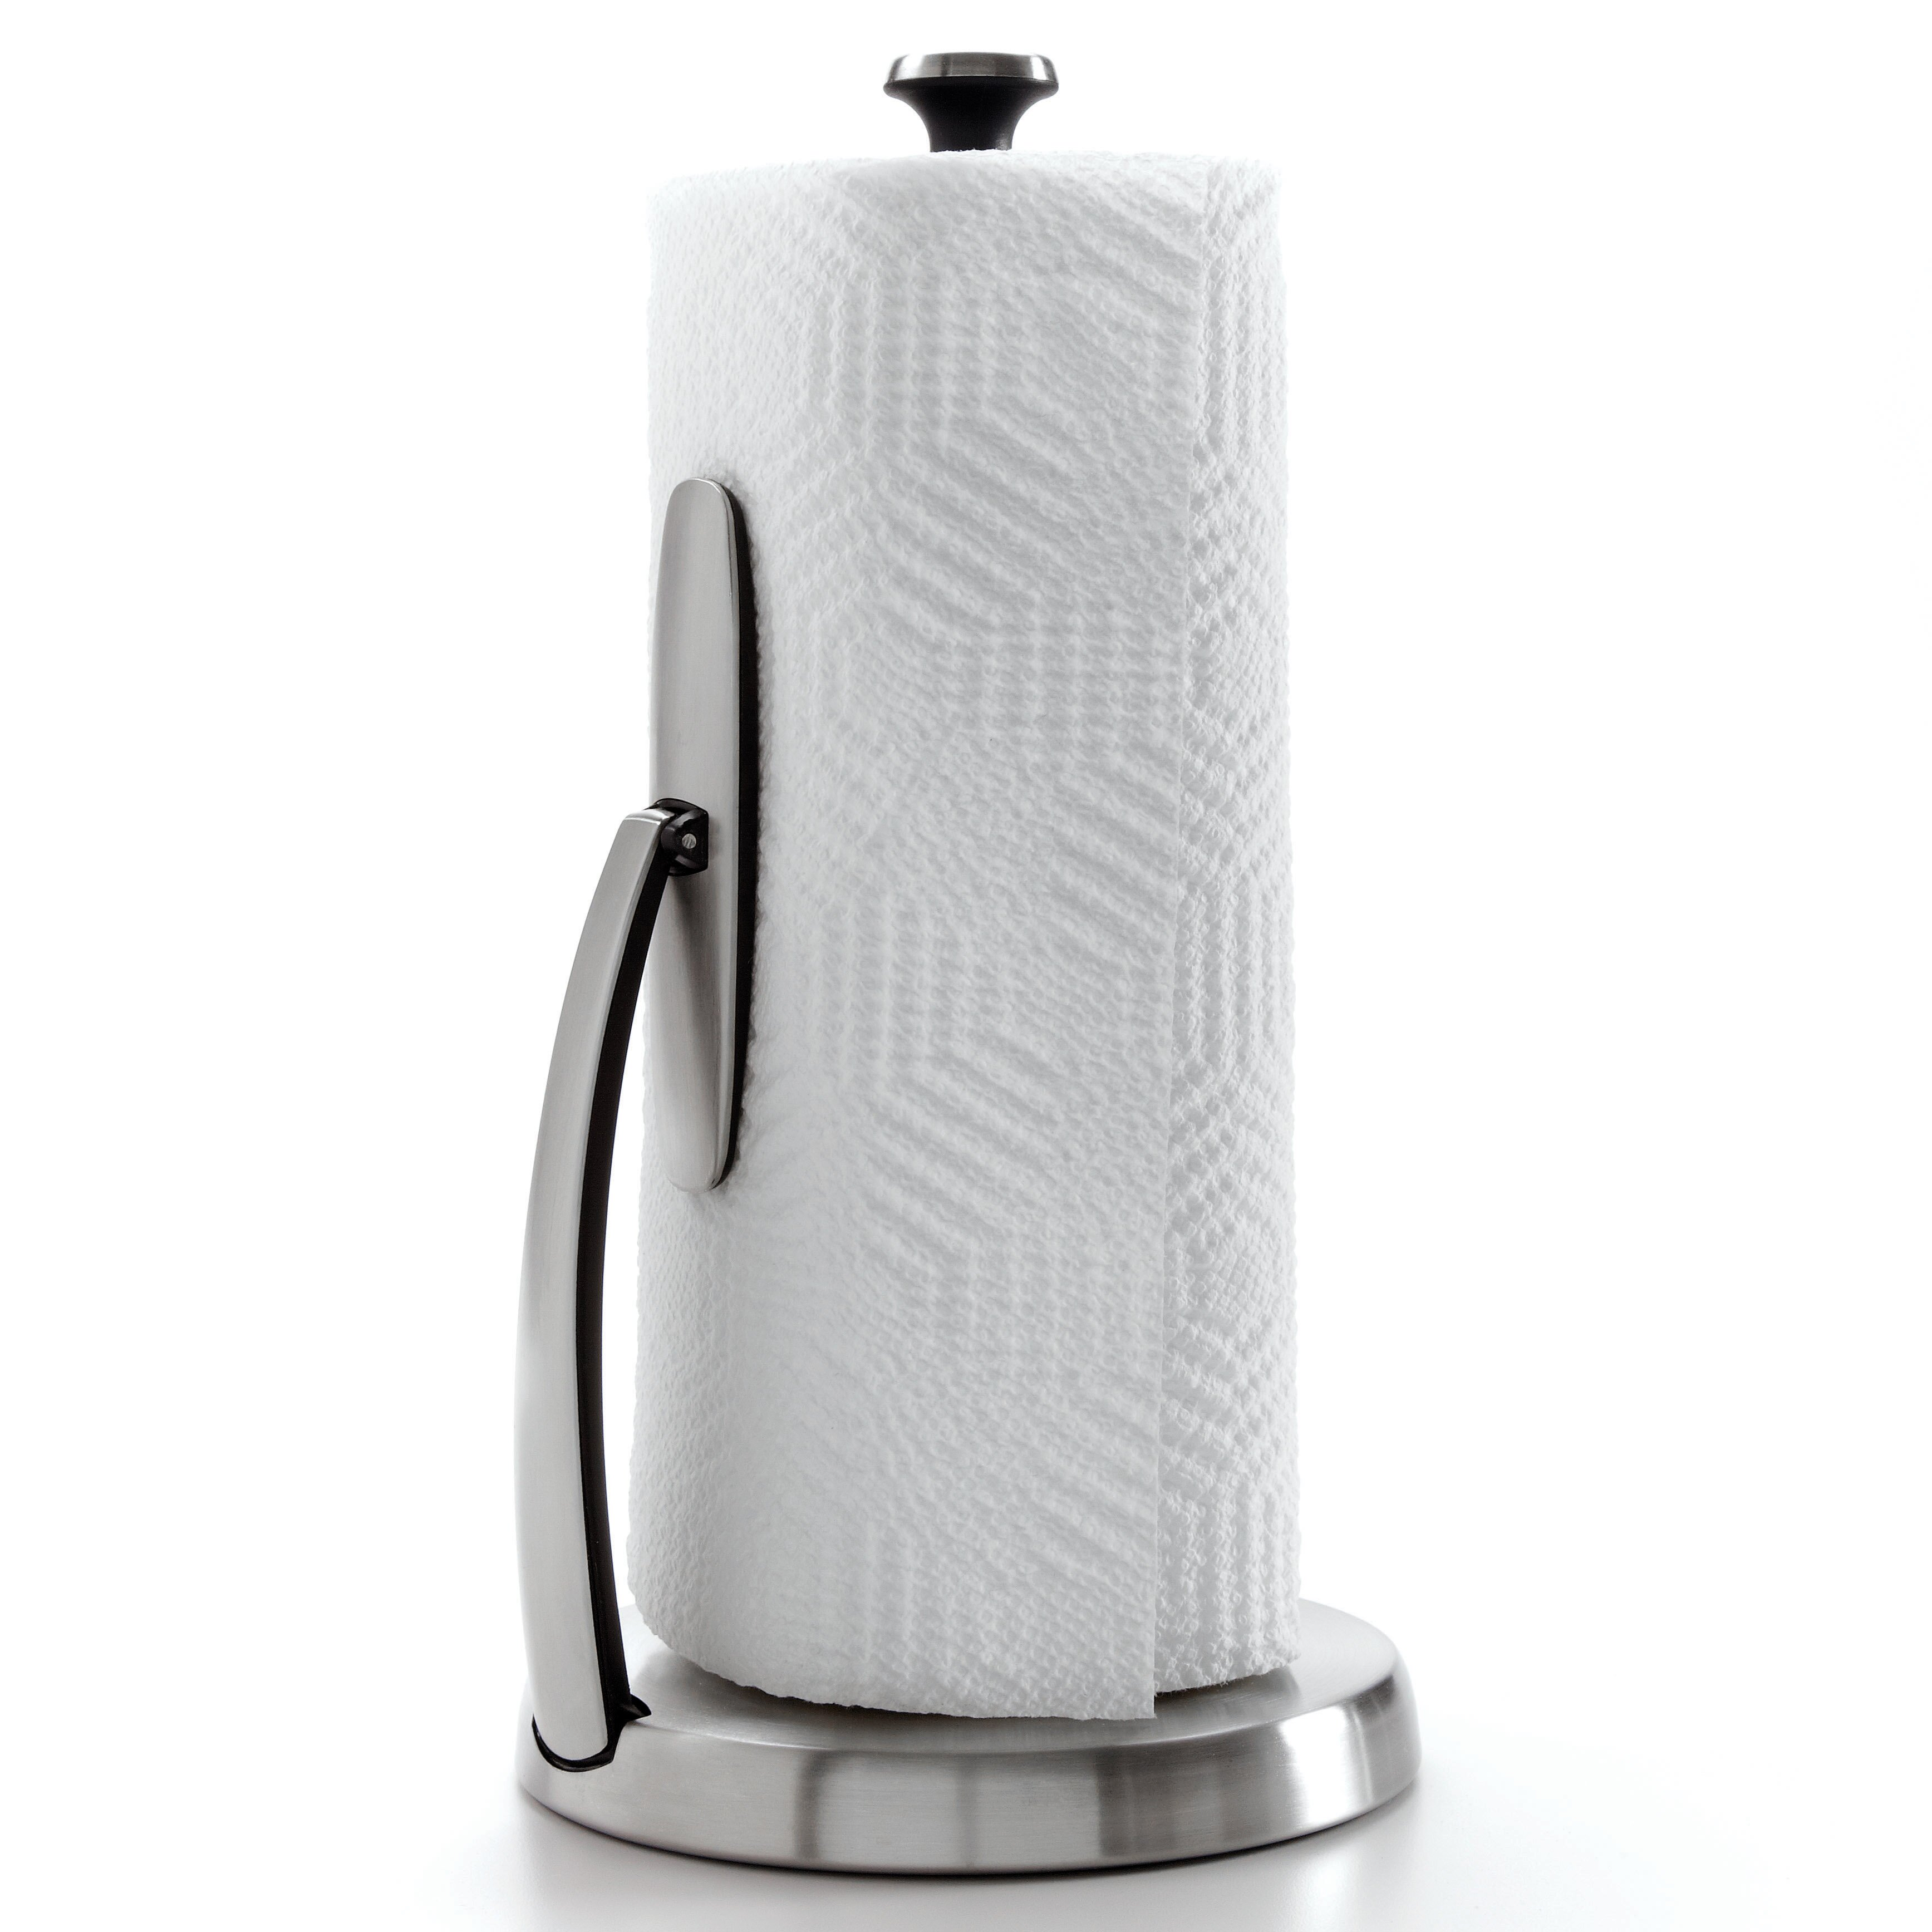 OXO Good Grips Simply Tear Paper Towel Holder amp Reviews  : OXO Good Grips Simply Tear Paper Towel Holder from www.wayfair.com size 3471 x 3471 jpeg 716kB